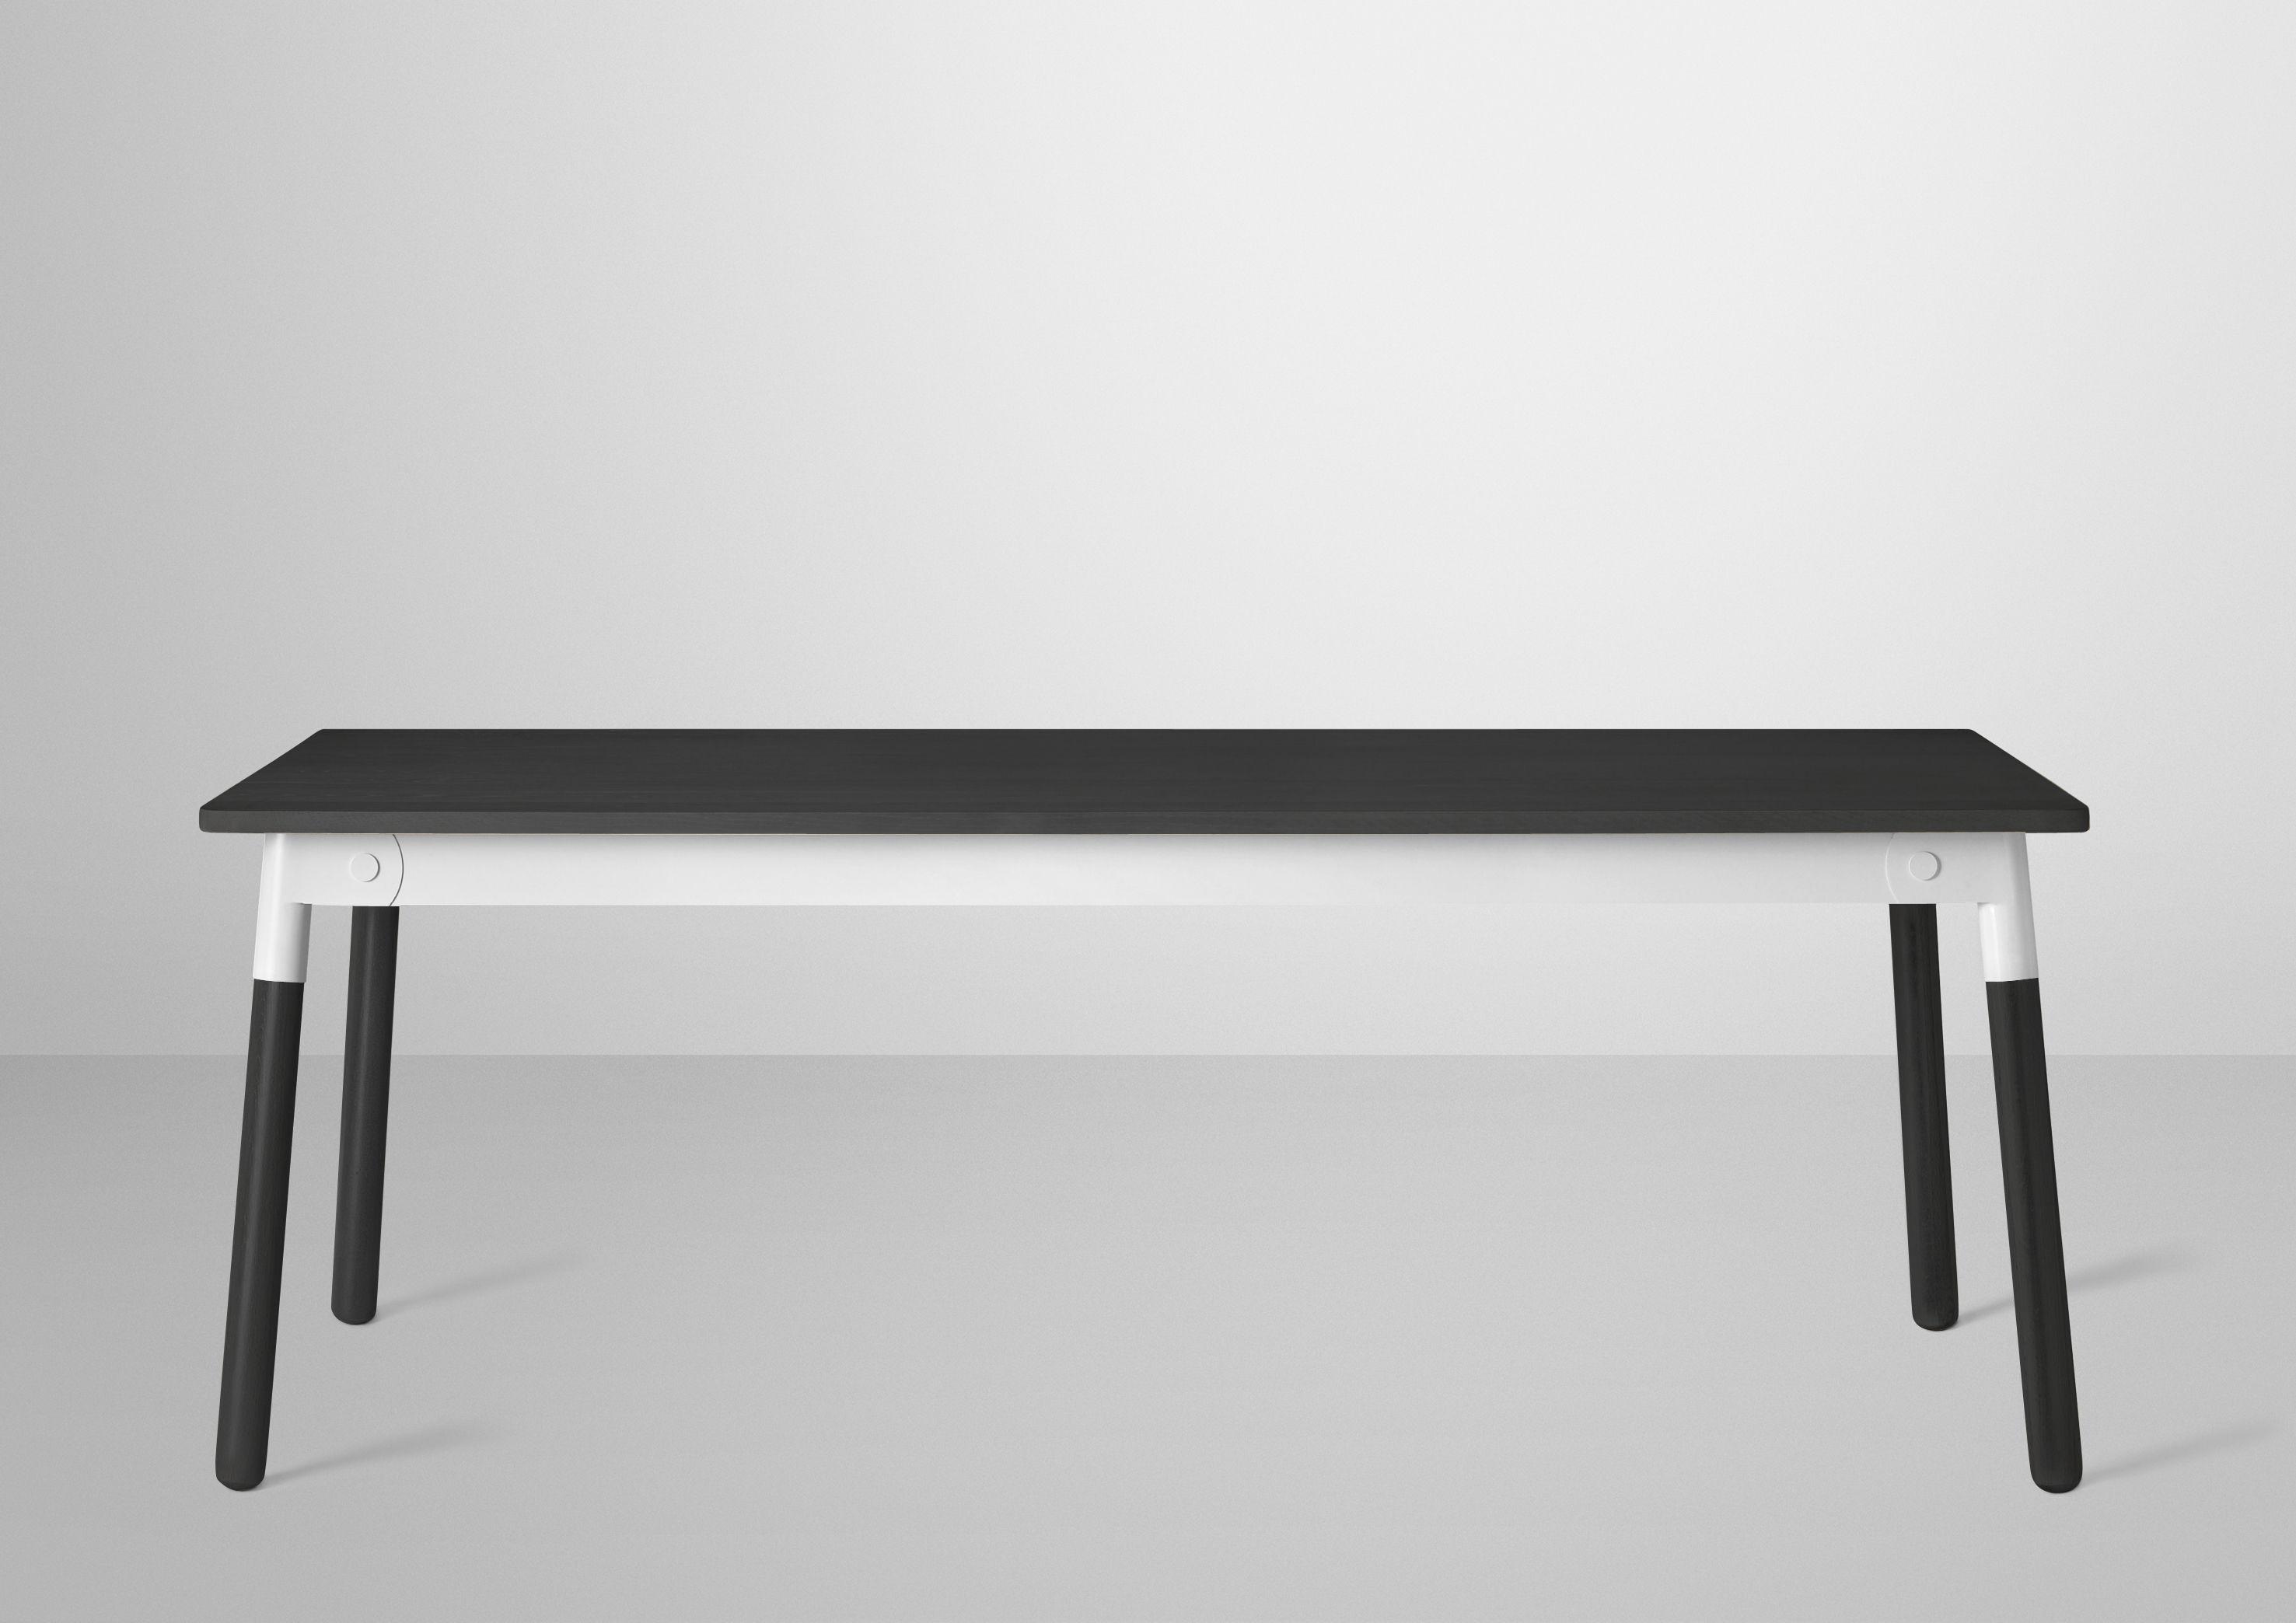 table adaptable noir 200 x 90 cm noir jonction blanche muuto. Black Bedroom Furniture Sets. Home Design Ideas